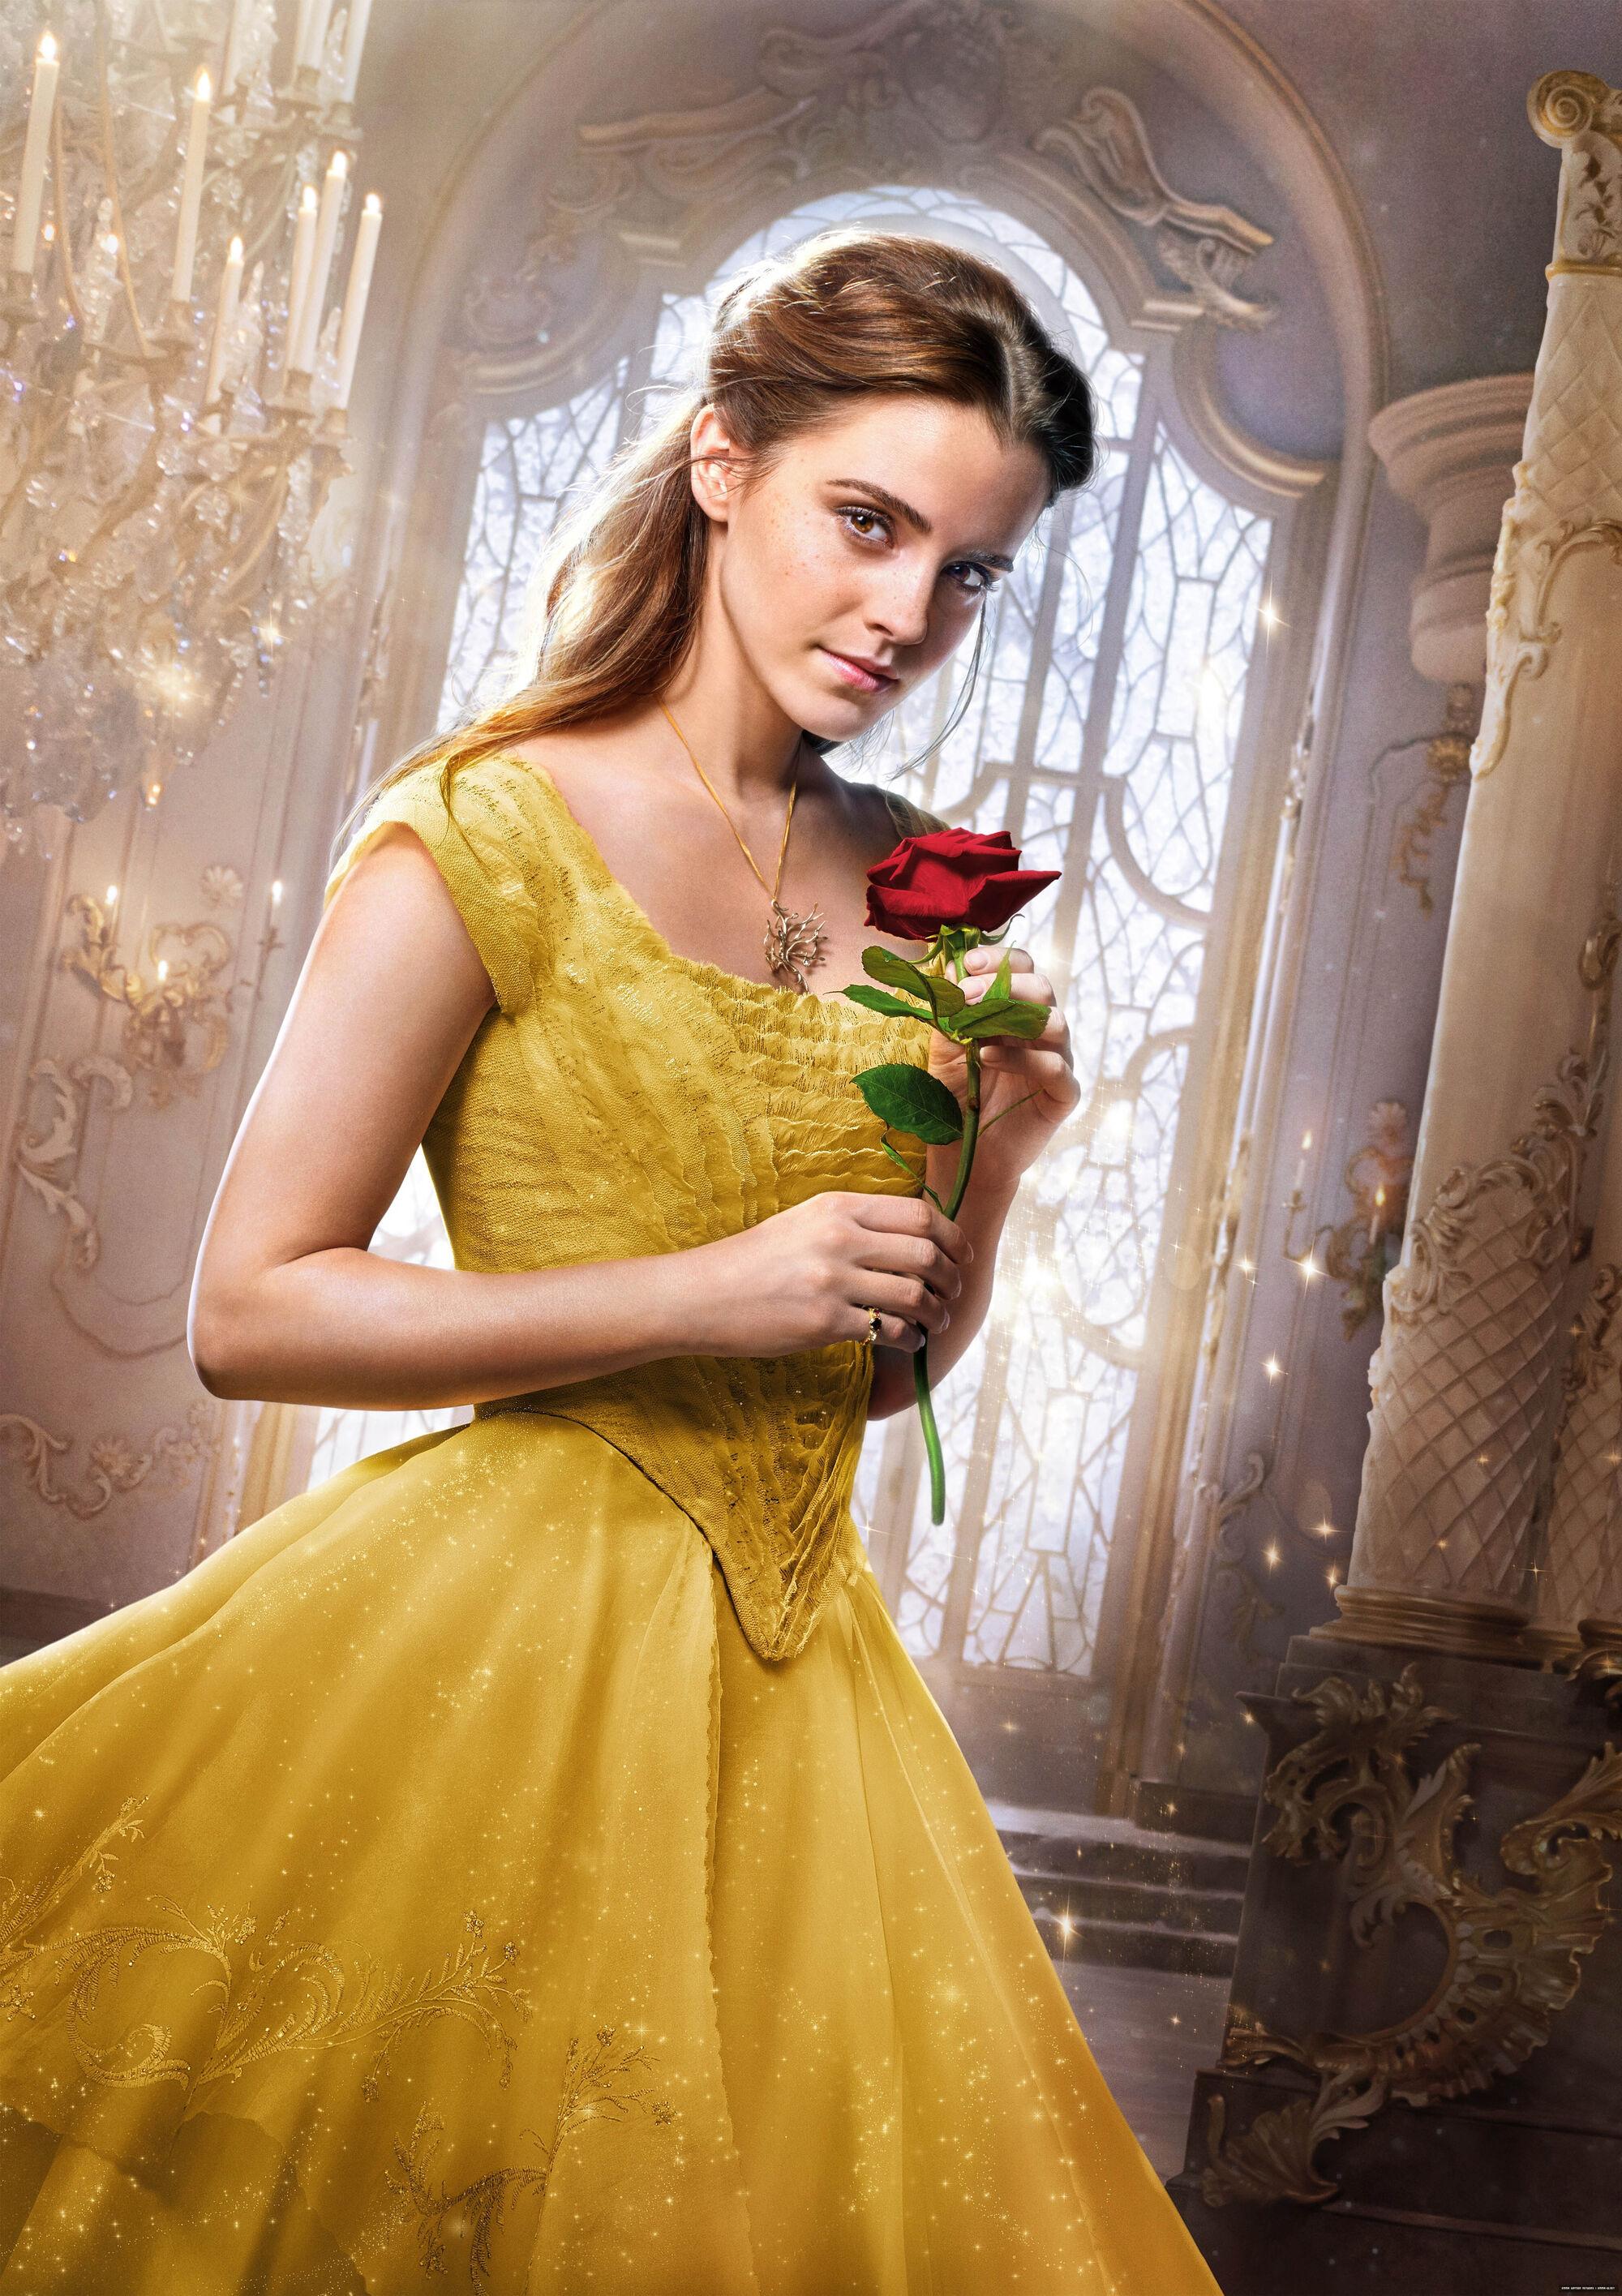 Belle (2017) in Wonderland